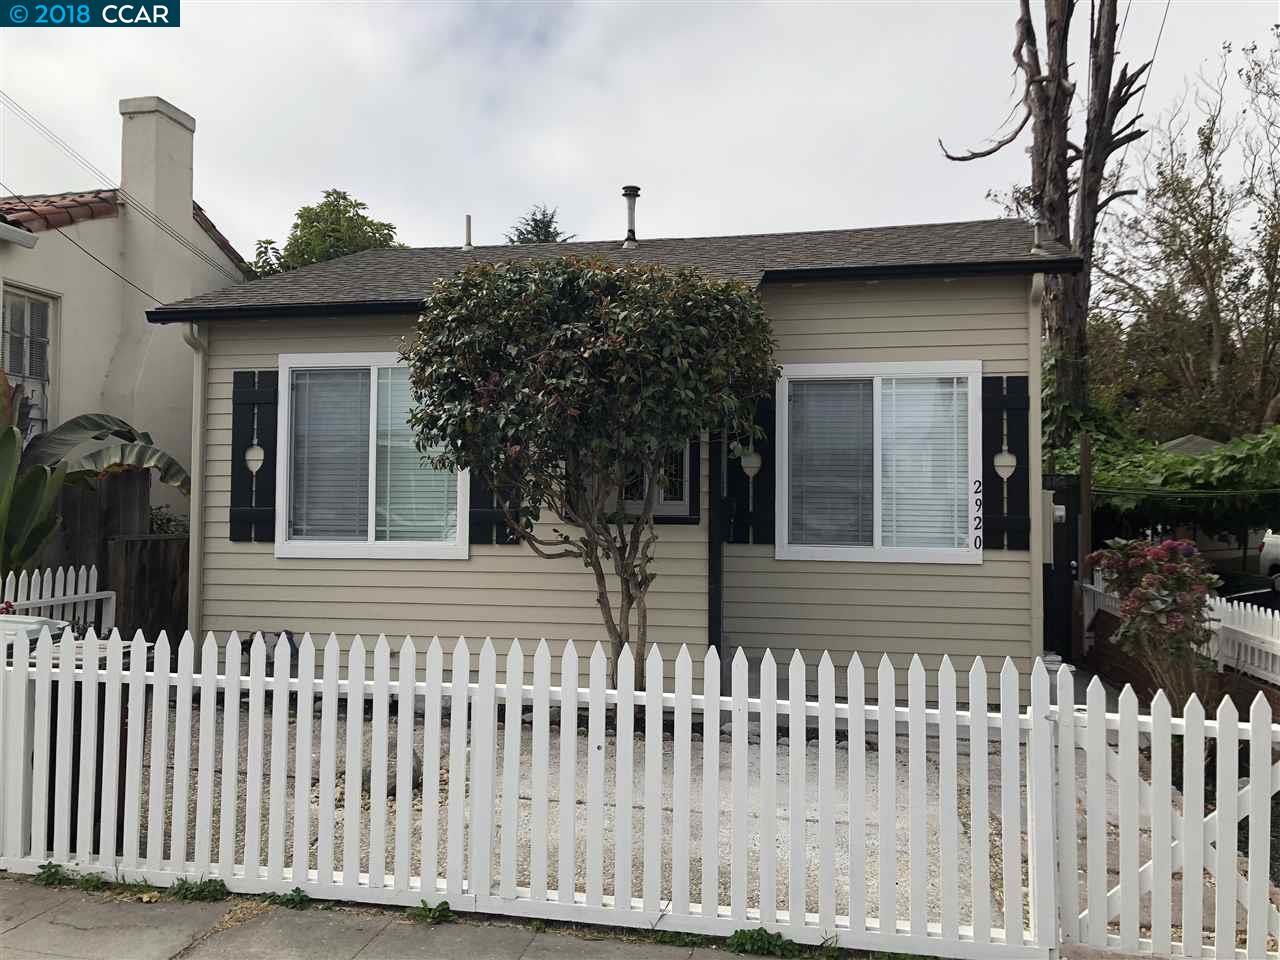 2920 NEVIN AVE, RICHMOND, CA 94804